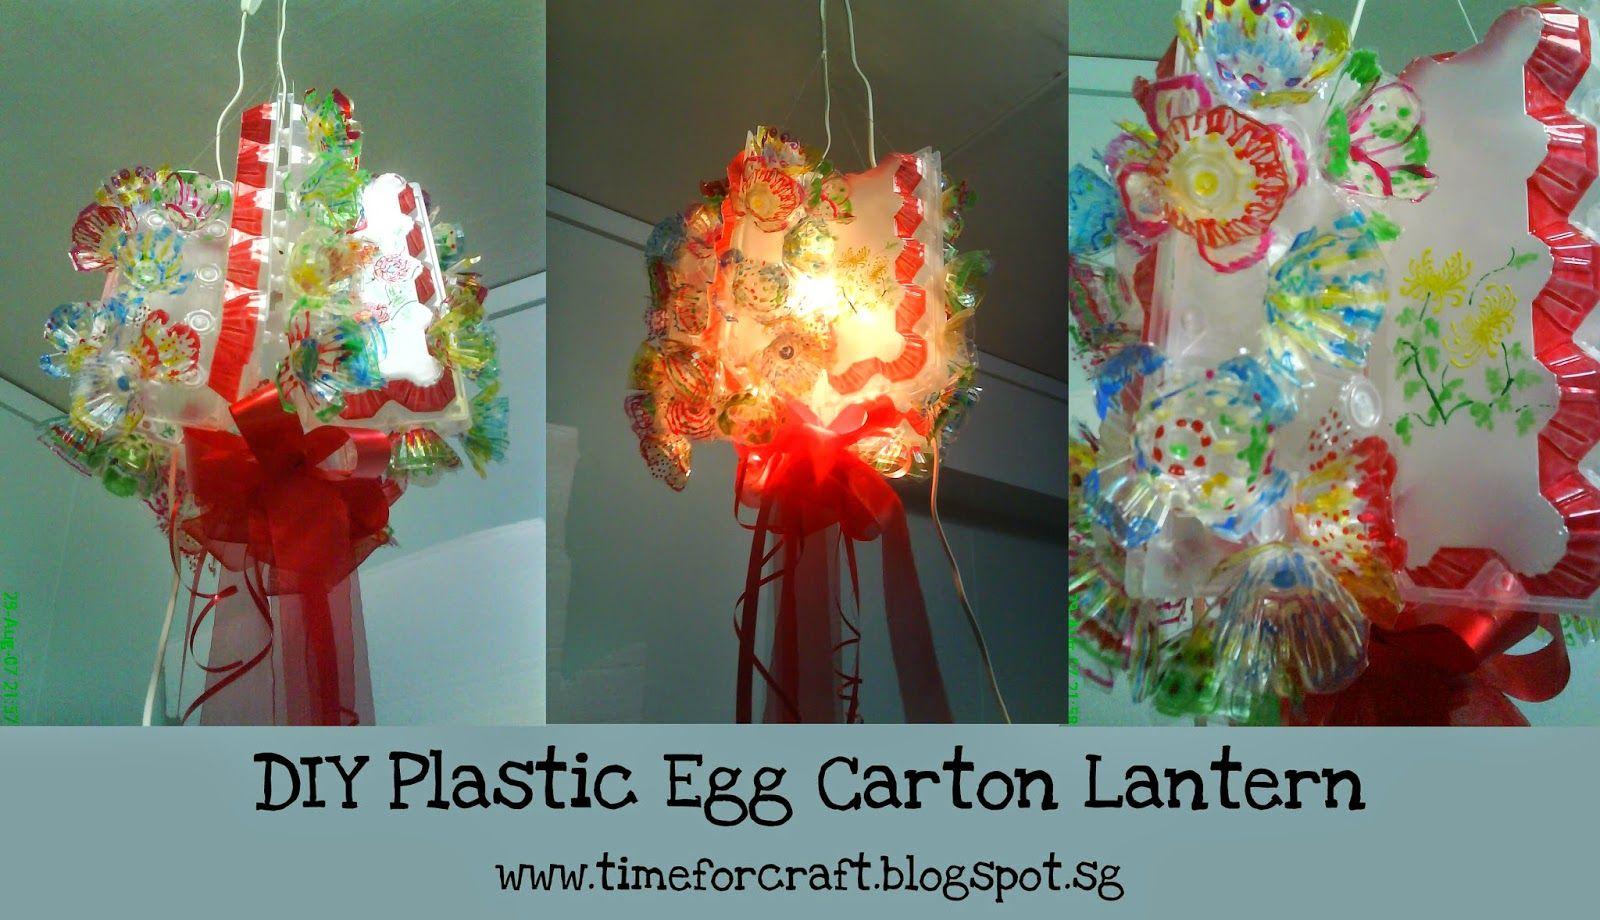 Diy Kid S Lantern Idea With Plastic Egg Carton Www Timeforcraft Blogspot Com Plastic Eggs Kids Lantern Diy For Kids